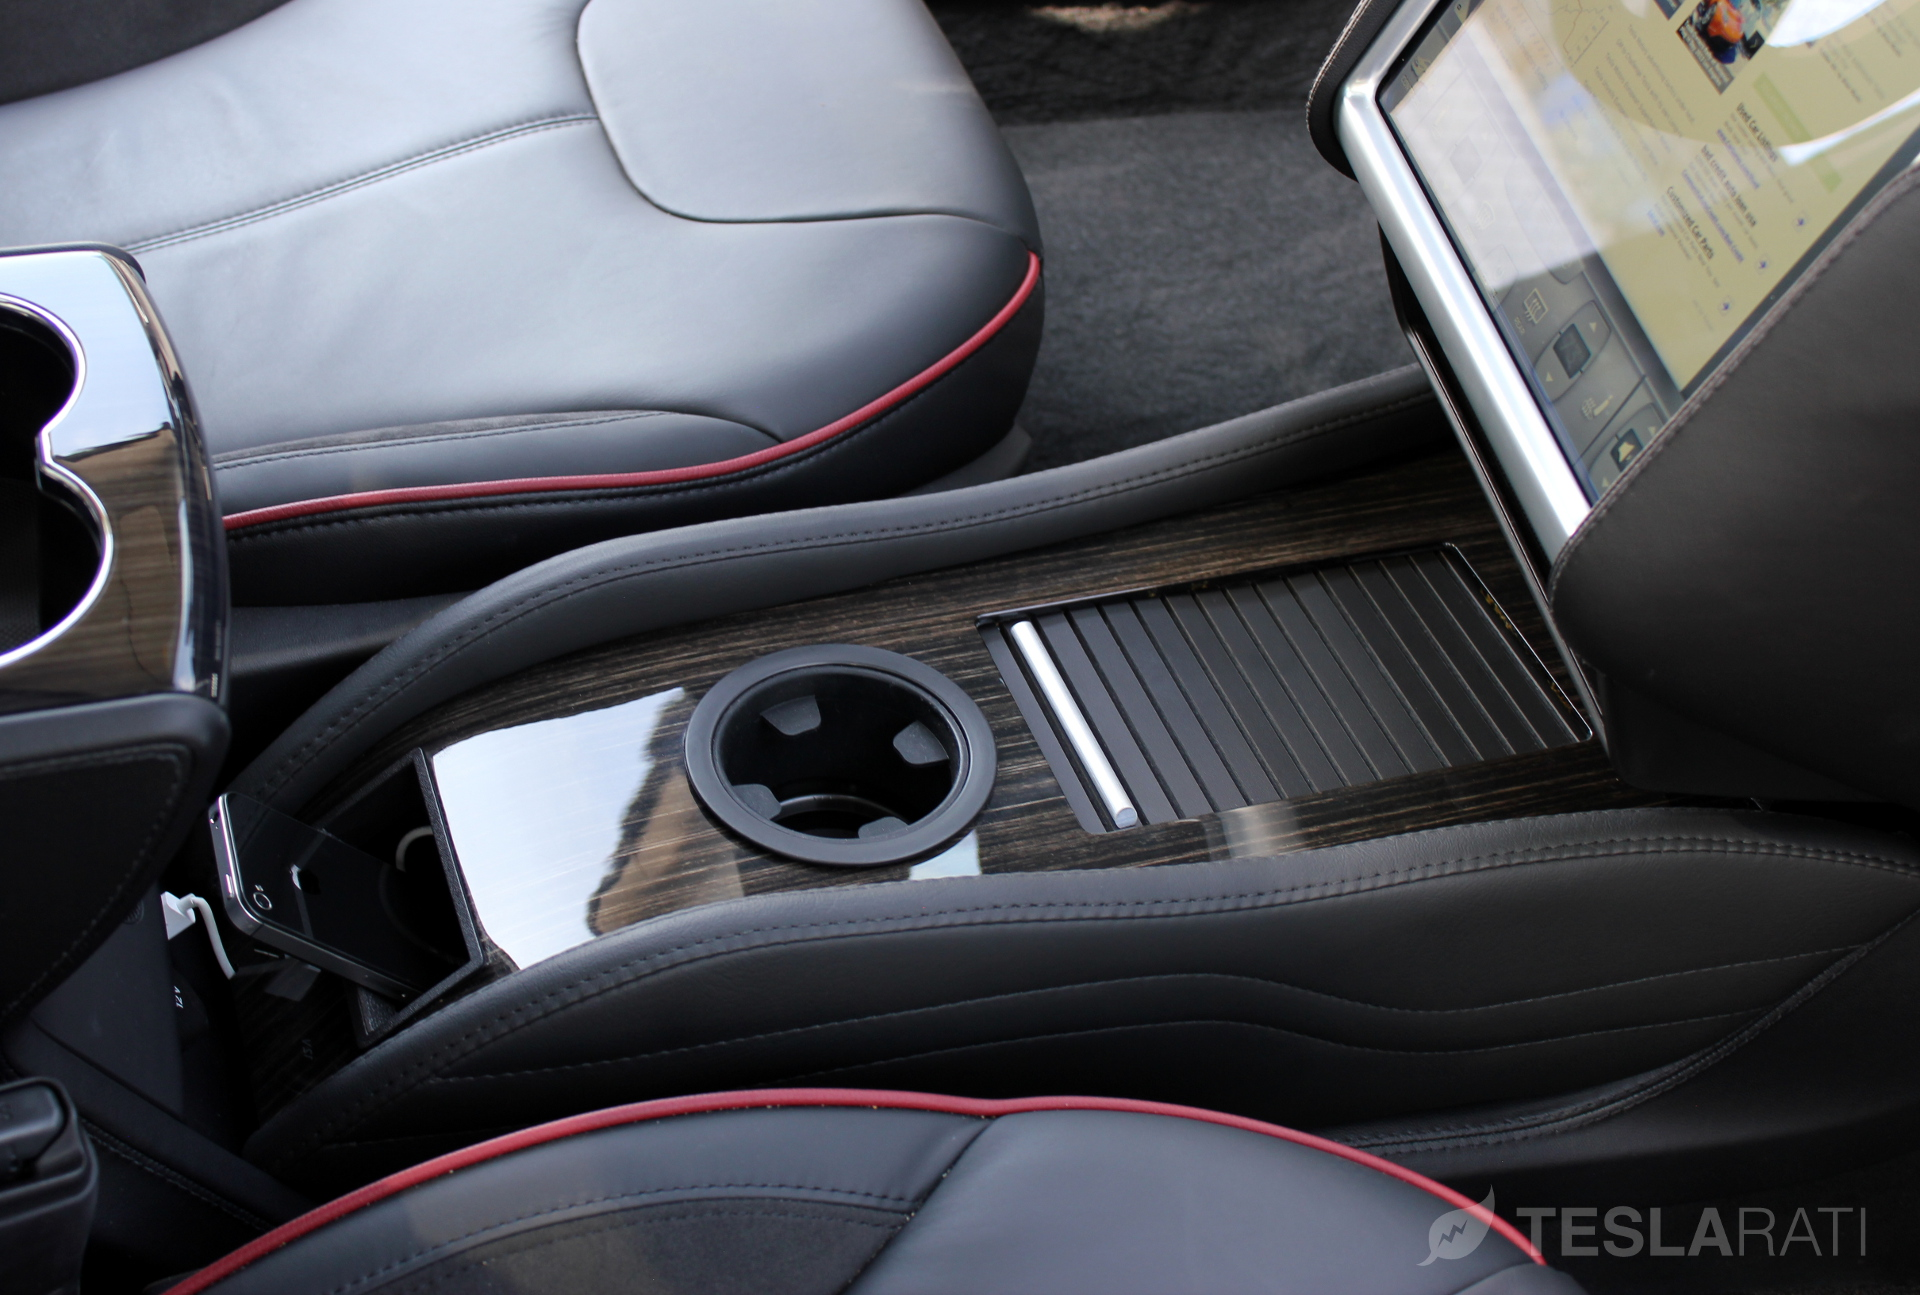 Tesla Model S Center Console Insert (CCI) Secured Storage